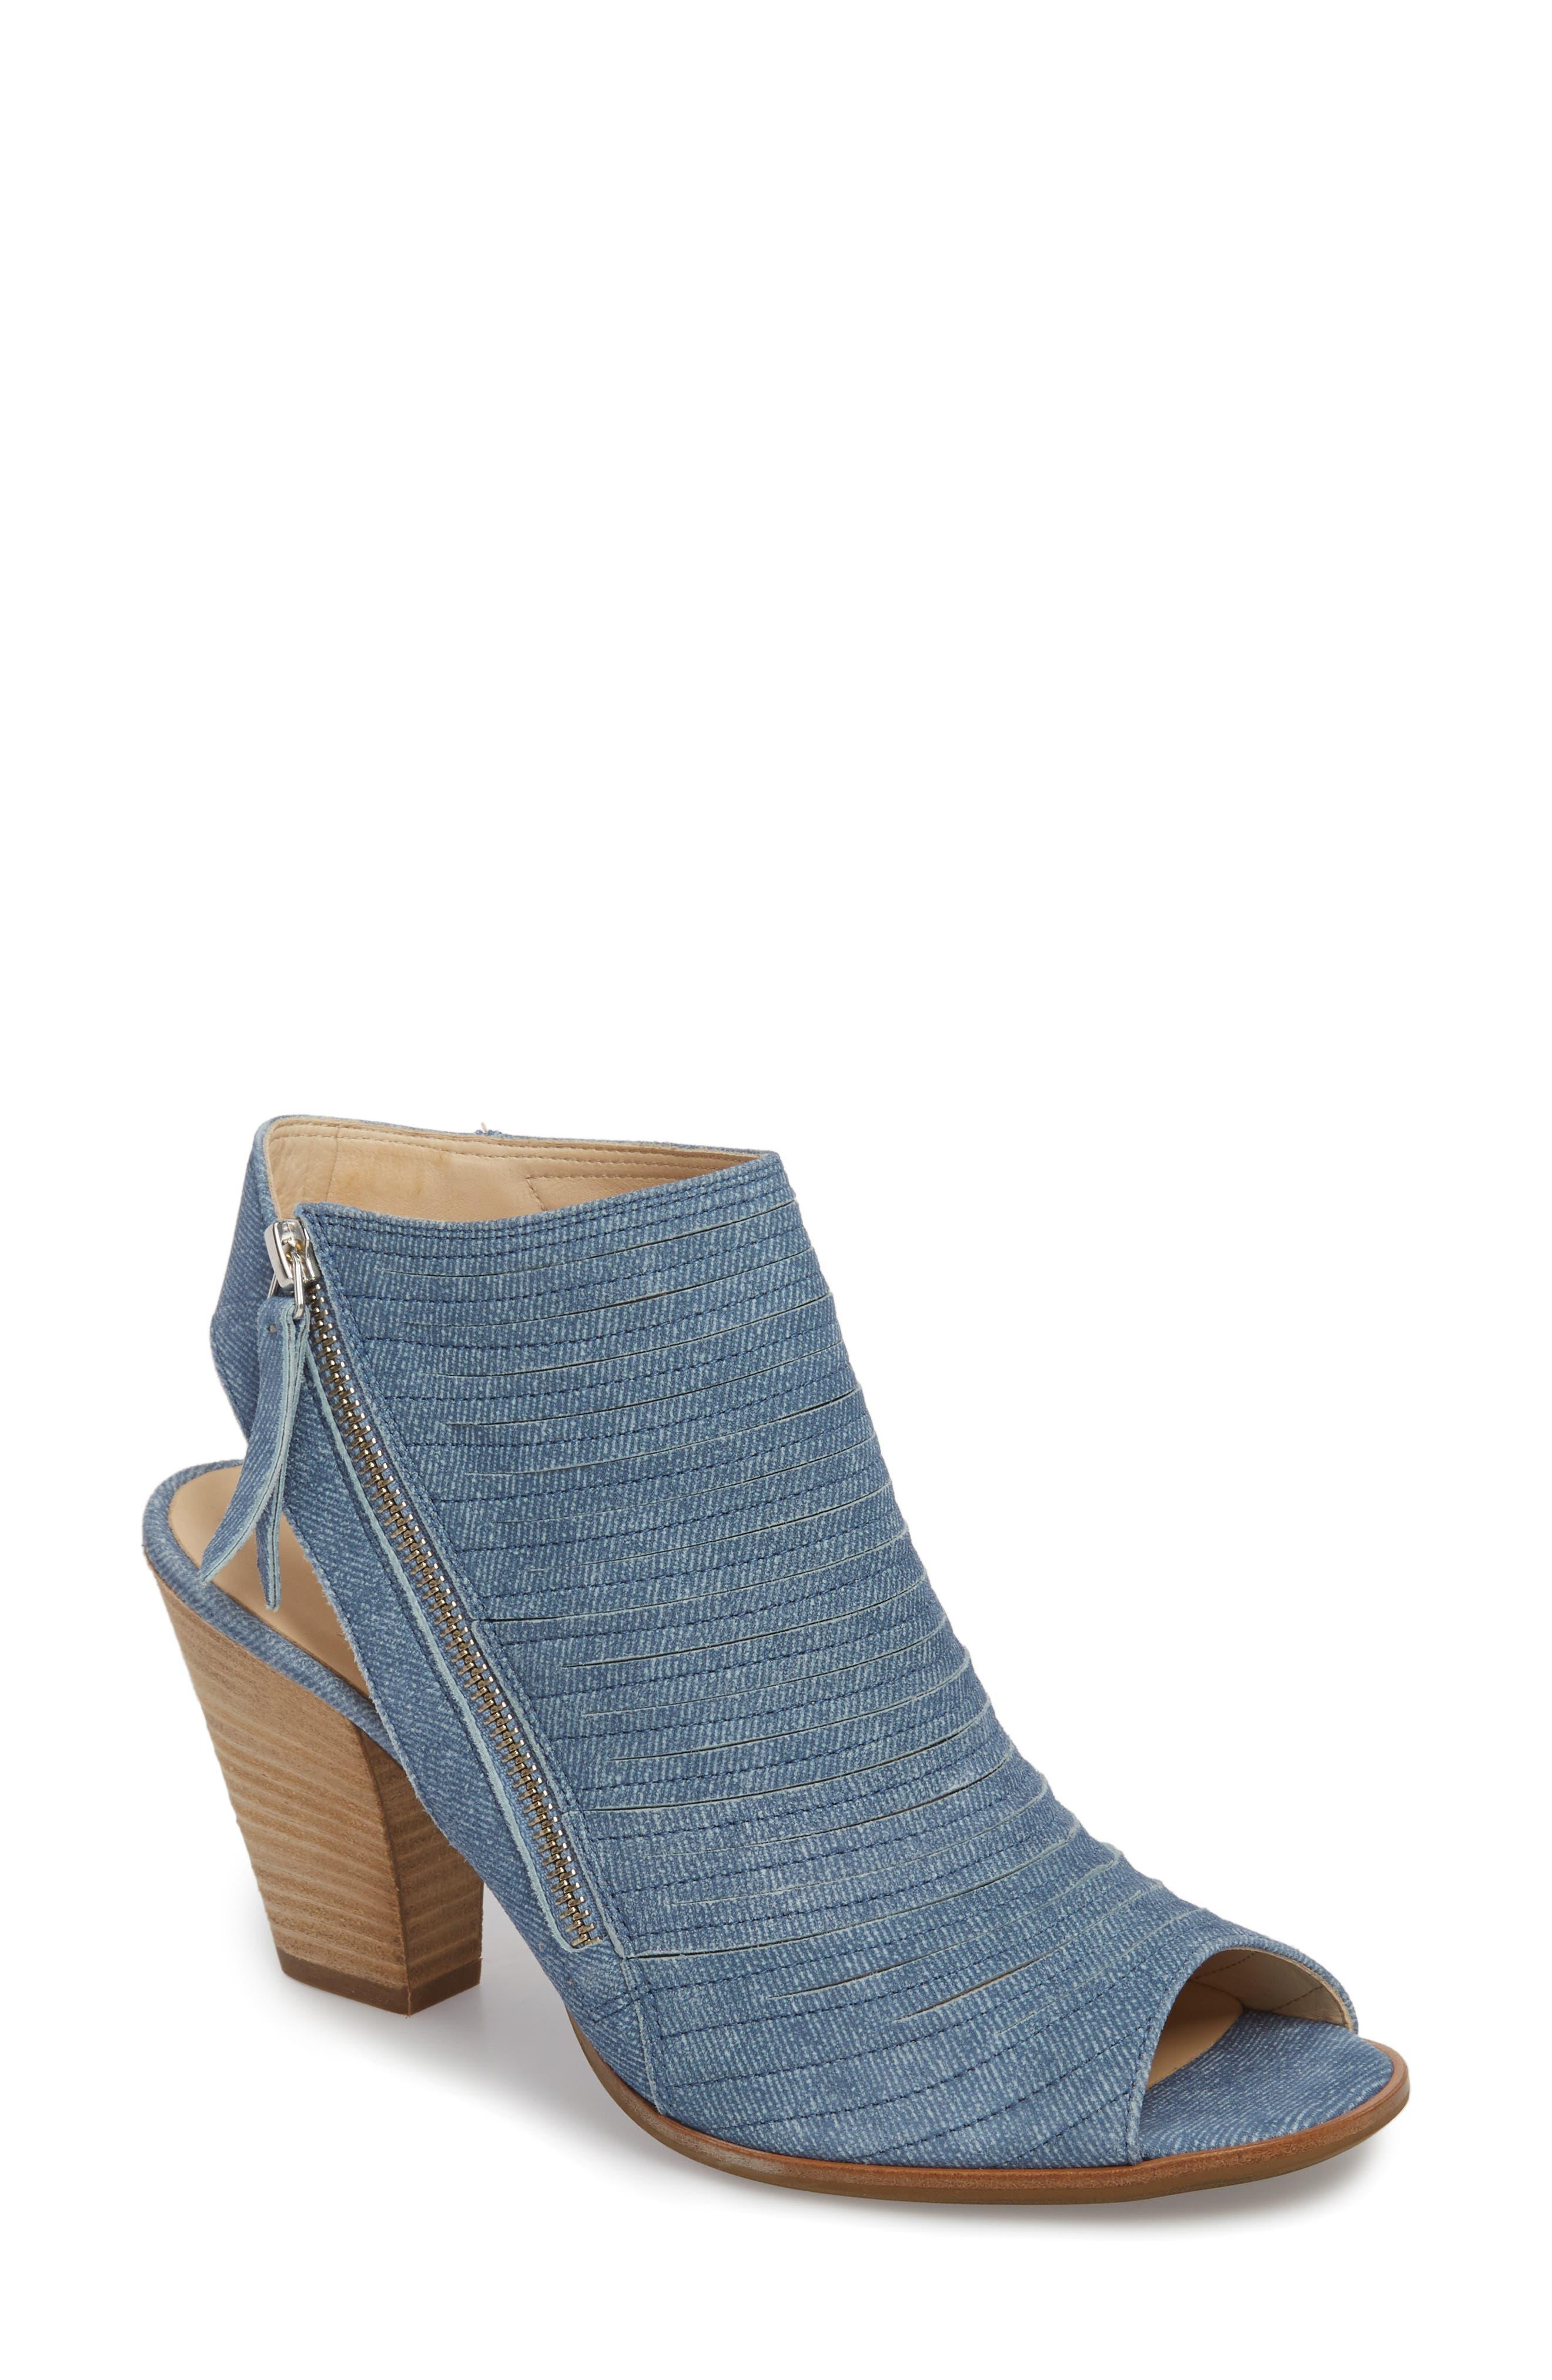 'Cayanne' Leather Peep Toe Sandal,                             Main thumbnail 2, color,